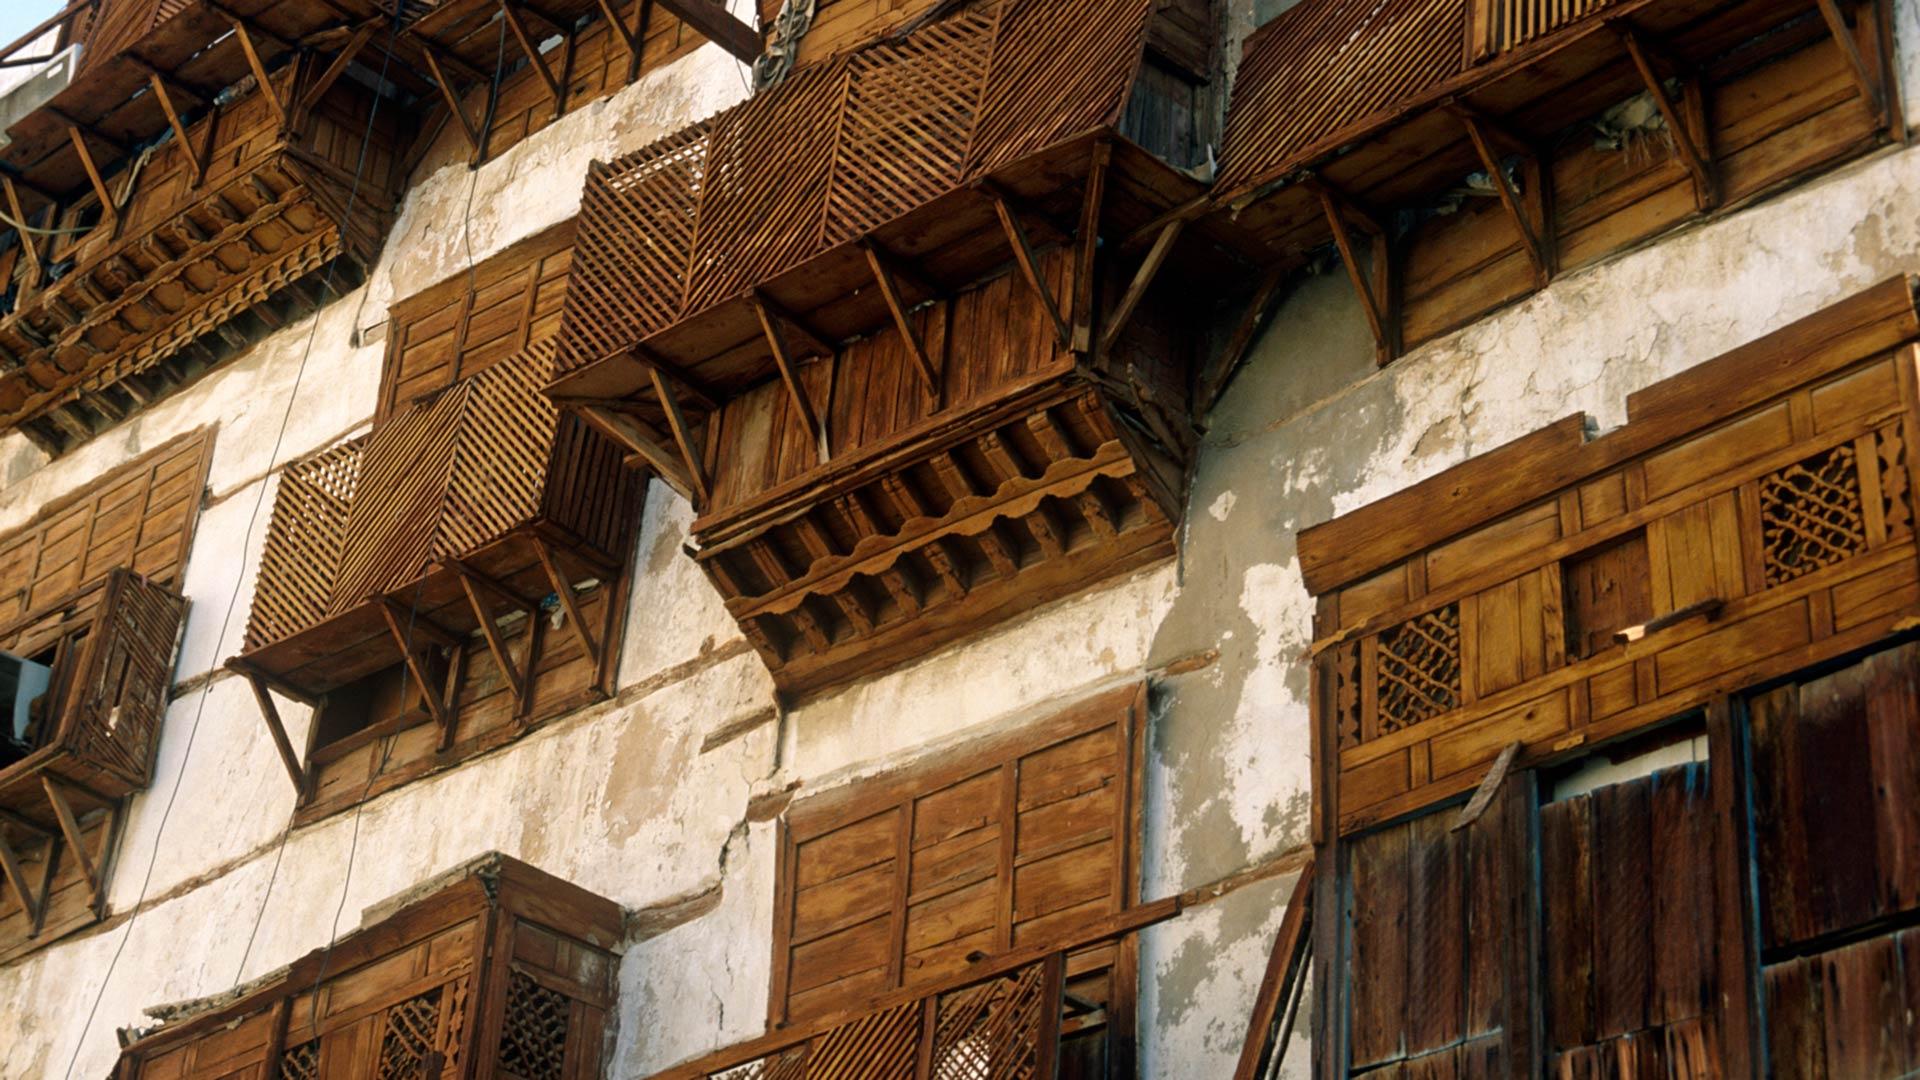 Architecture in Al-Balad, the historic heart of Jeddah, Saudi Arabia